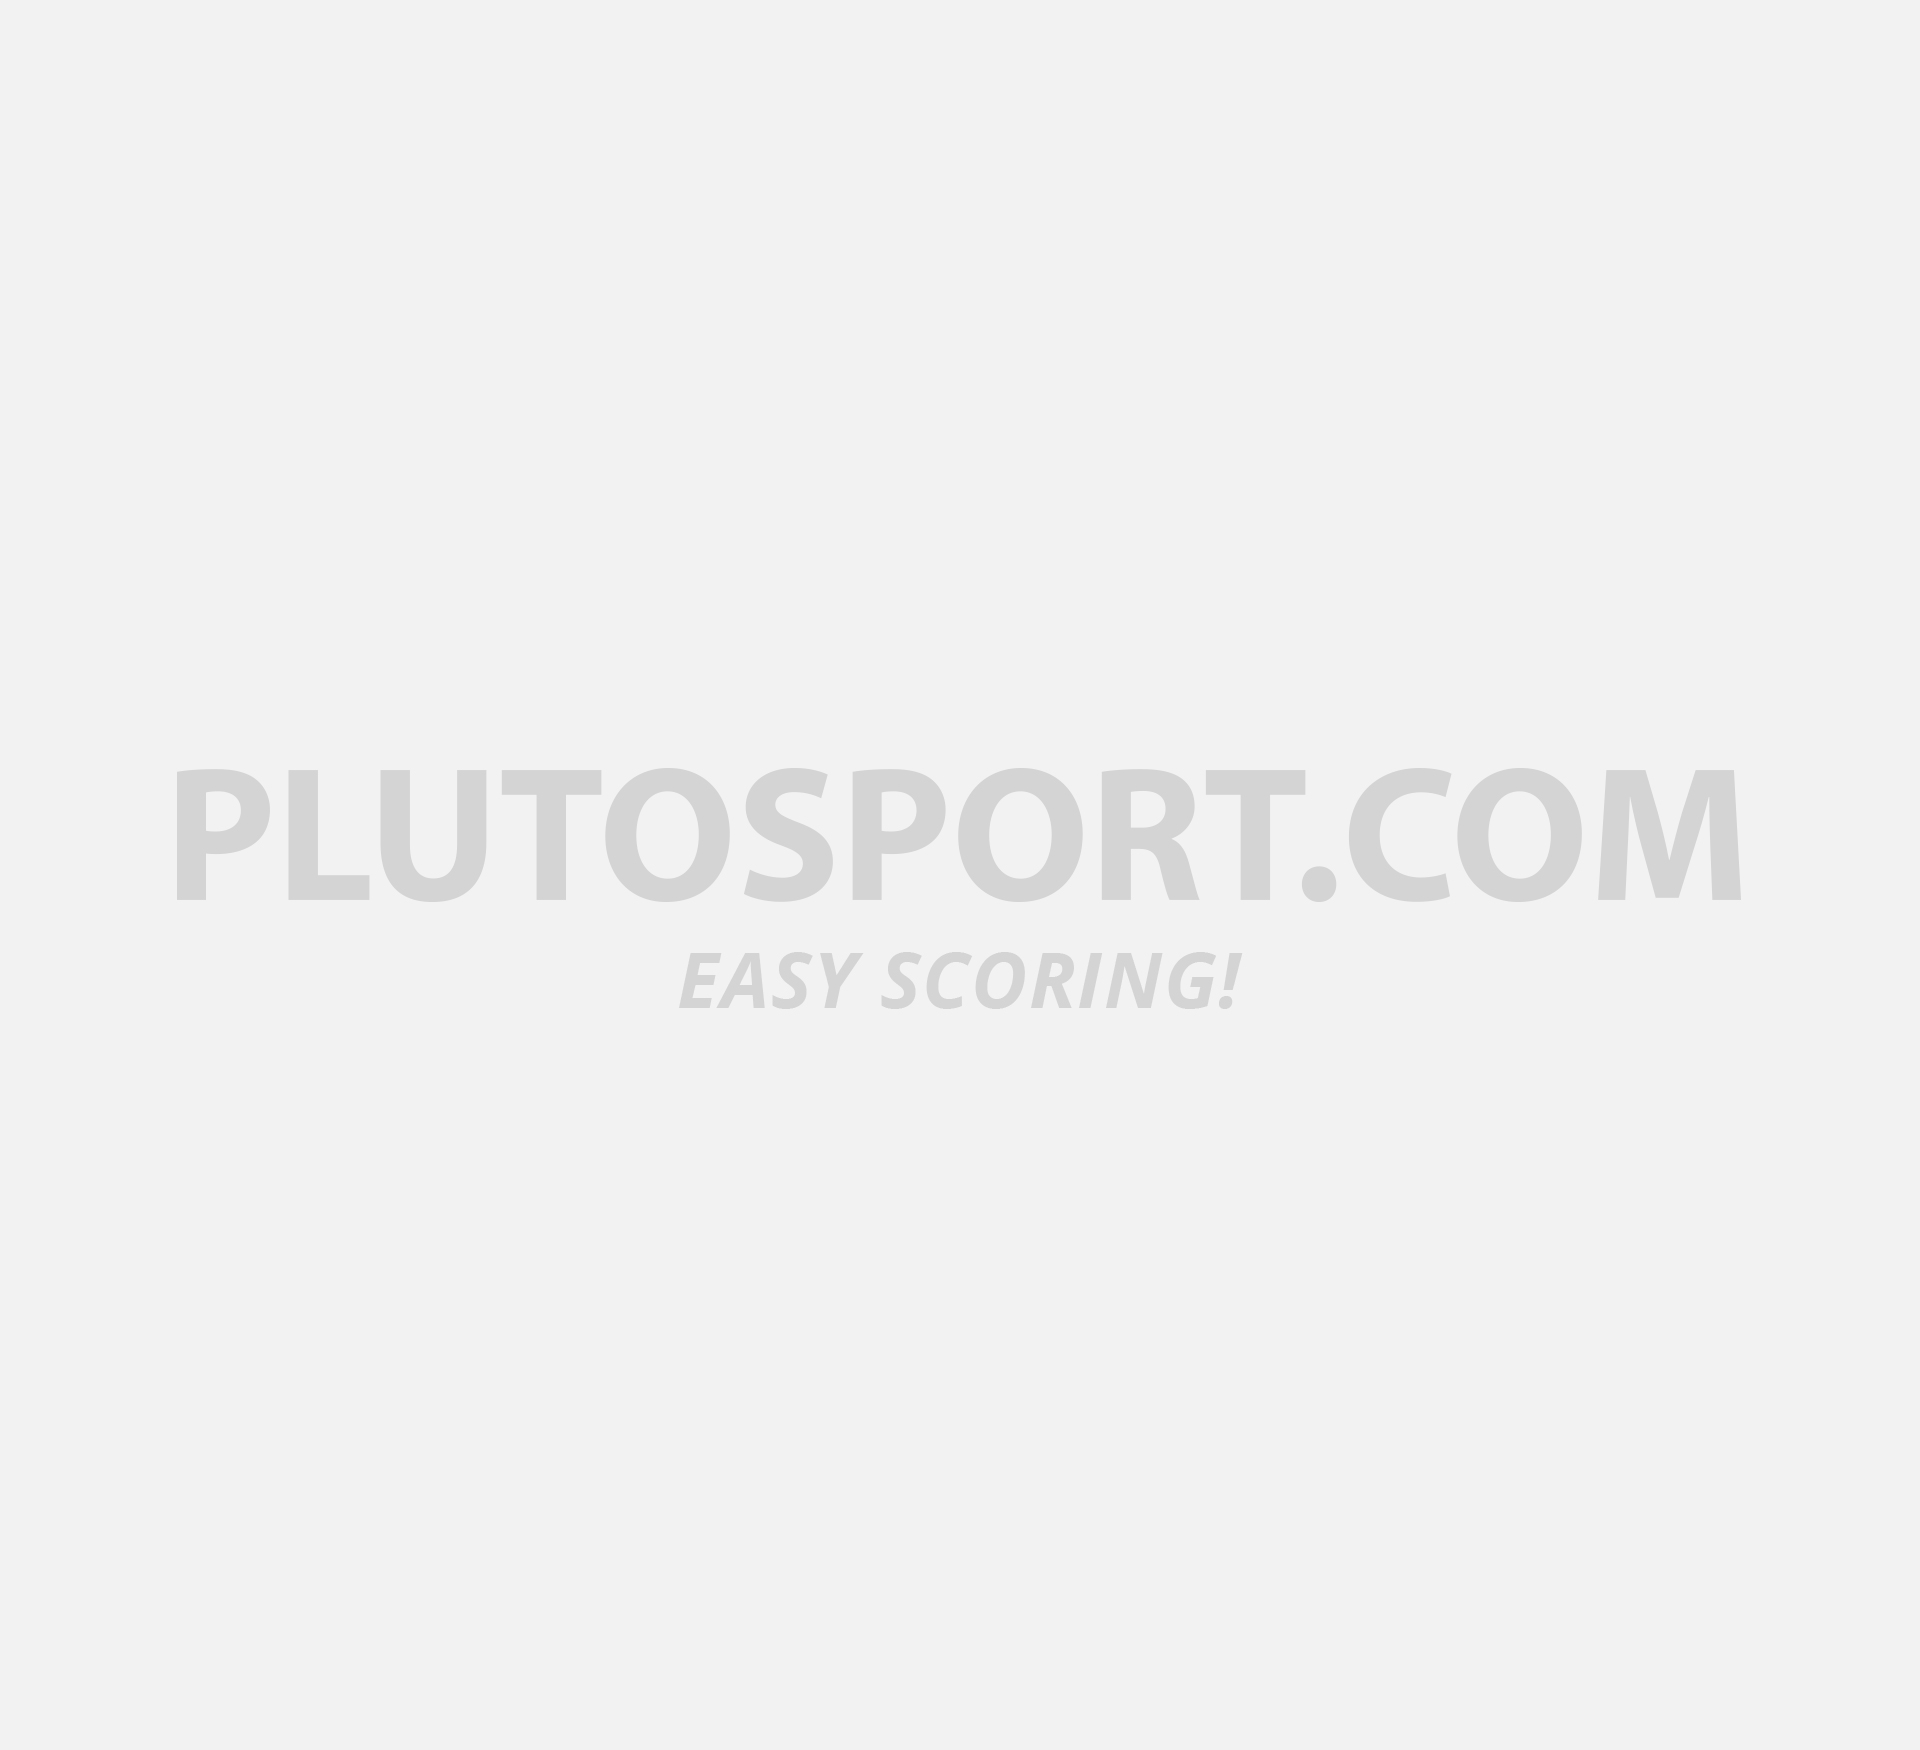 5b14070e8ee2 Puma Pro Training II Medium Bag - Without shoe compartment - Bags -  Football - Sports